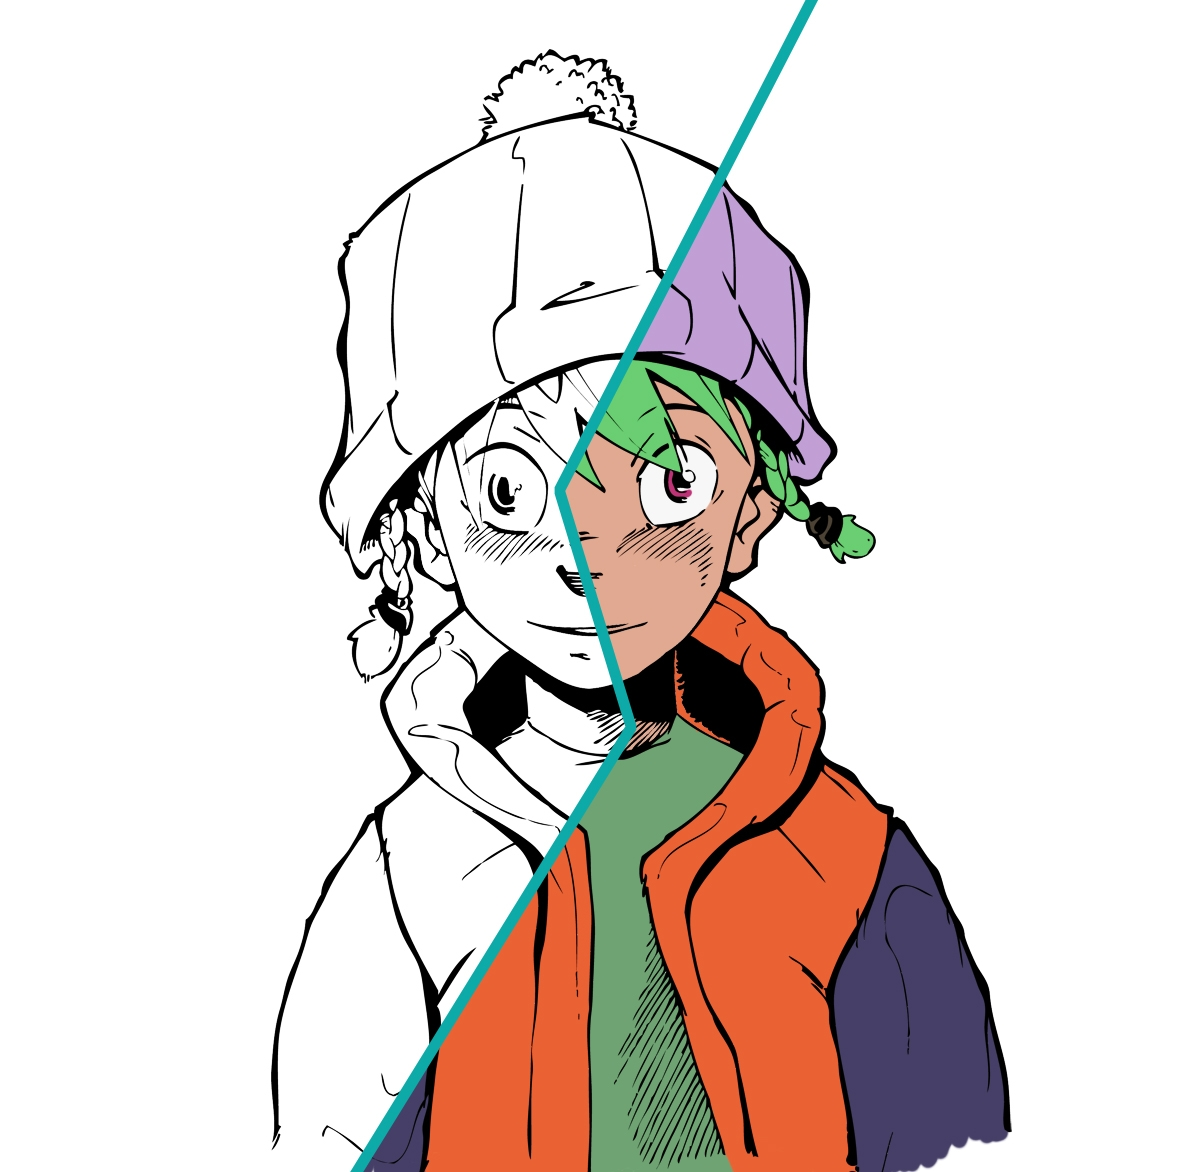 tuto colorisation 02